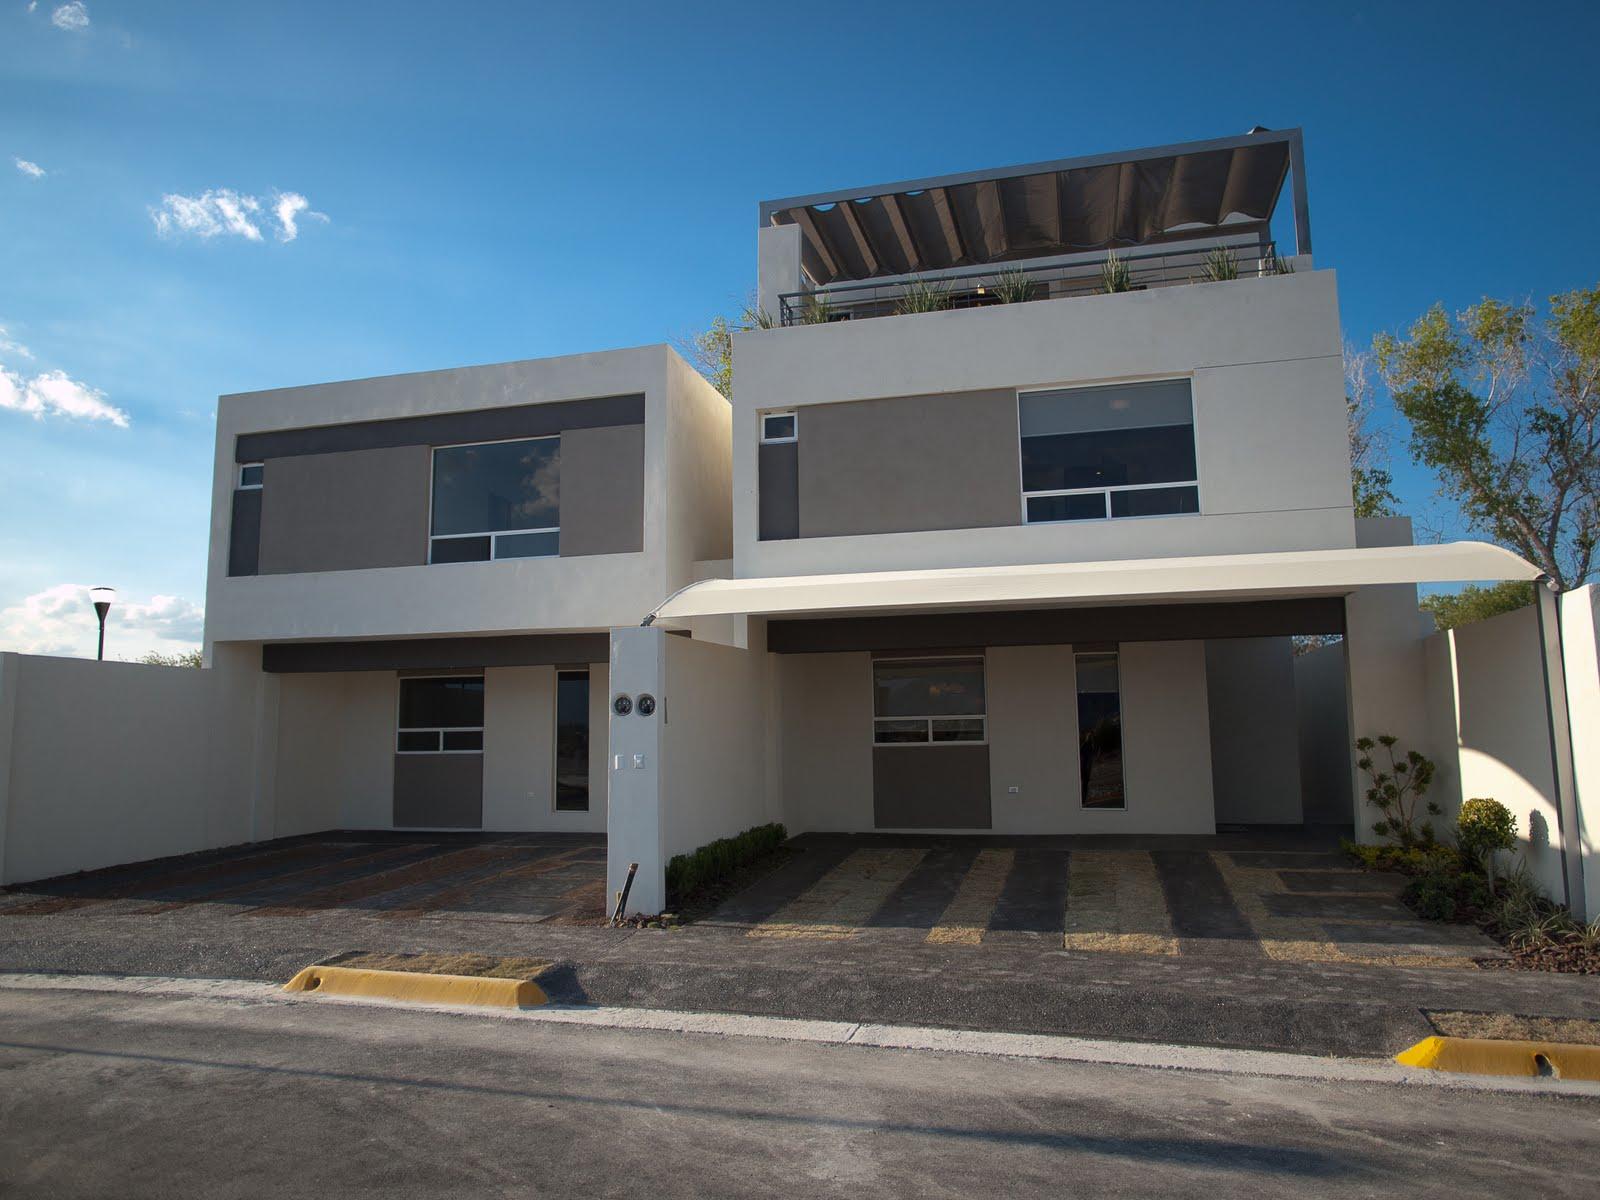 Presupuesto pintar exterior casa online habitissimo for Casa online